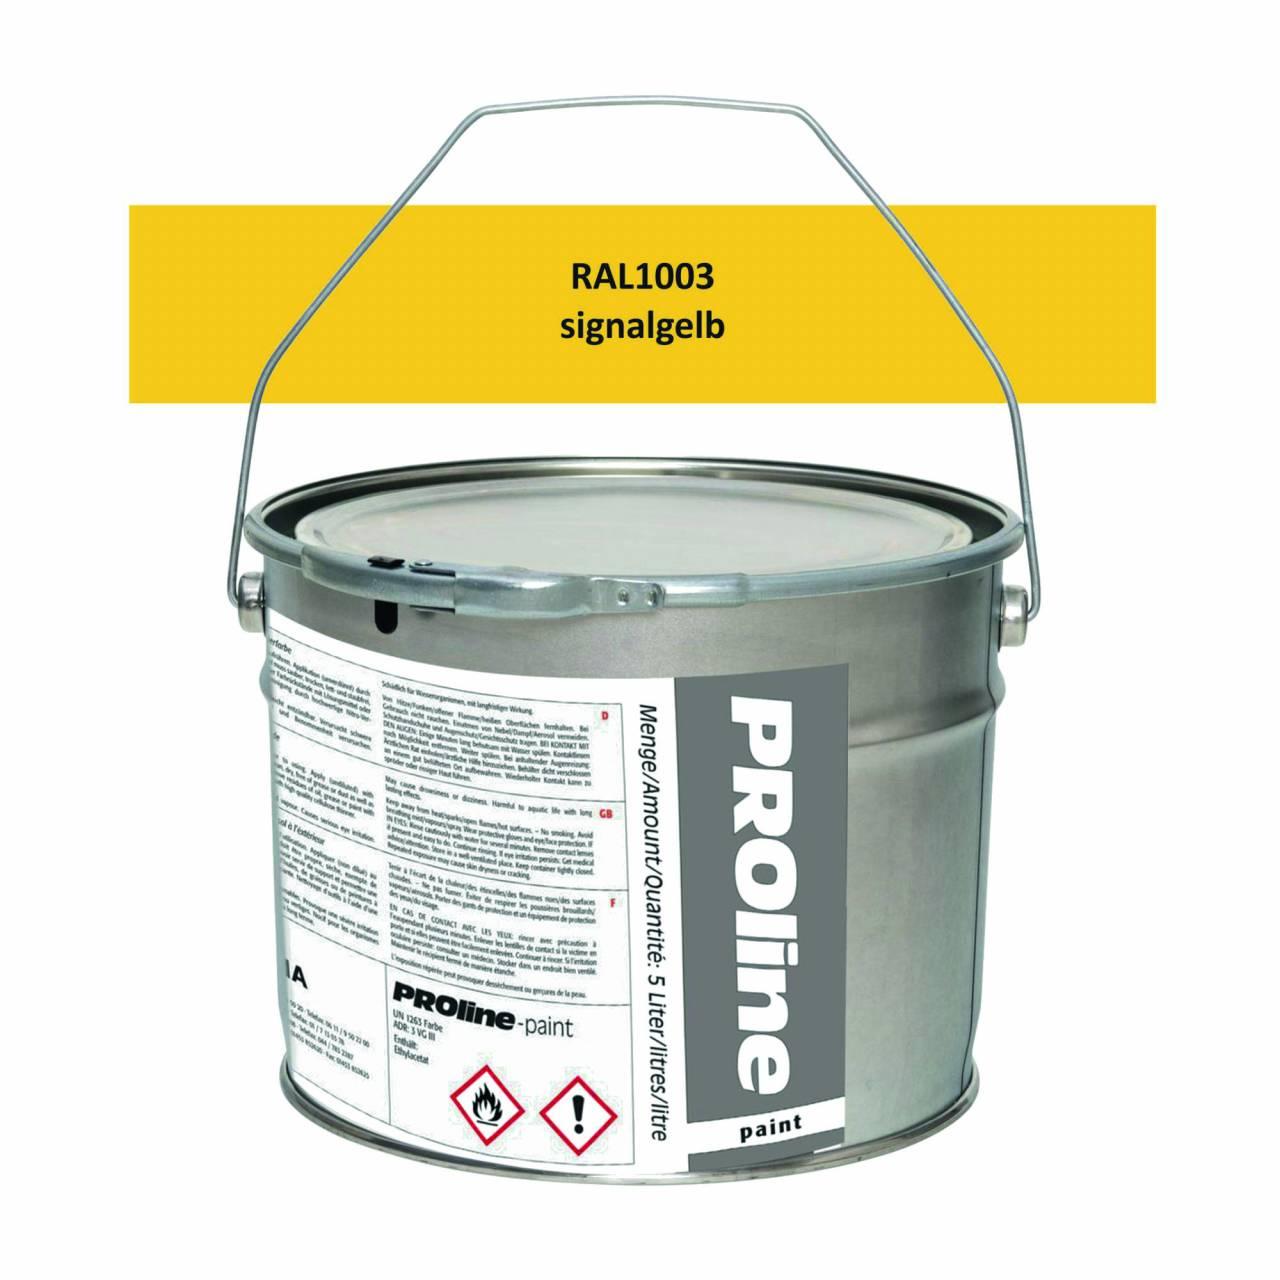 Aussen-Markierfarbe 'PROline-paint' GELB / Eimer a 5,0 Liter